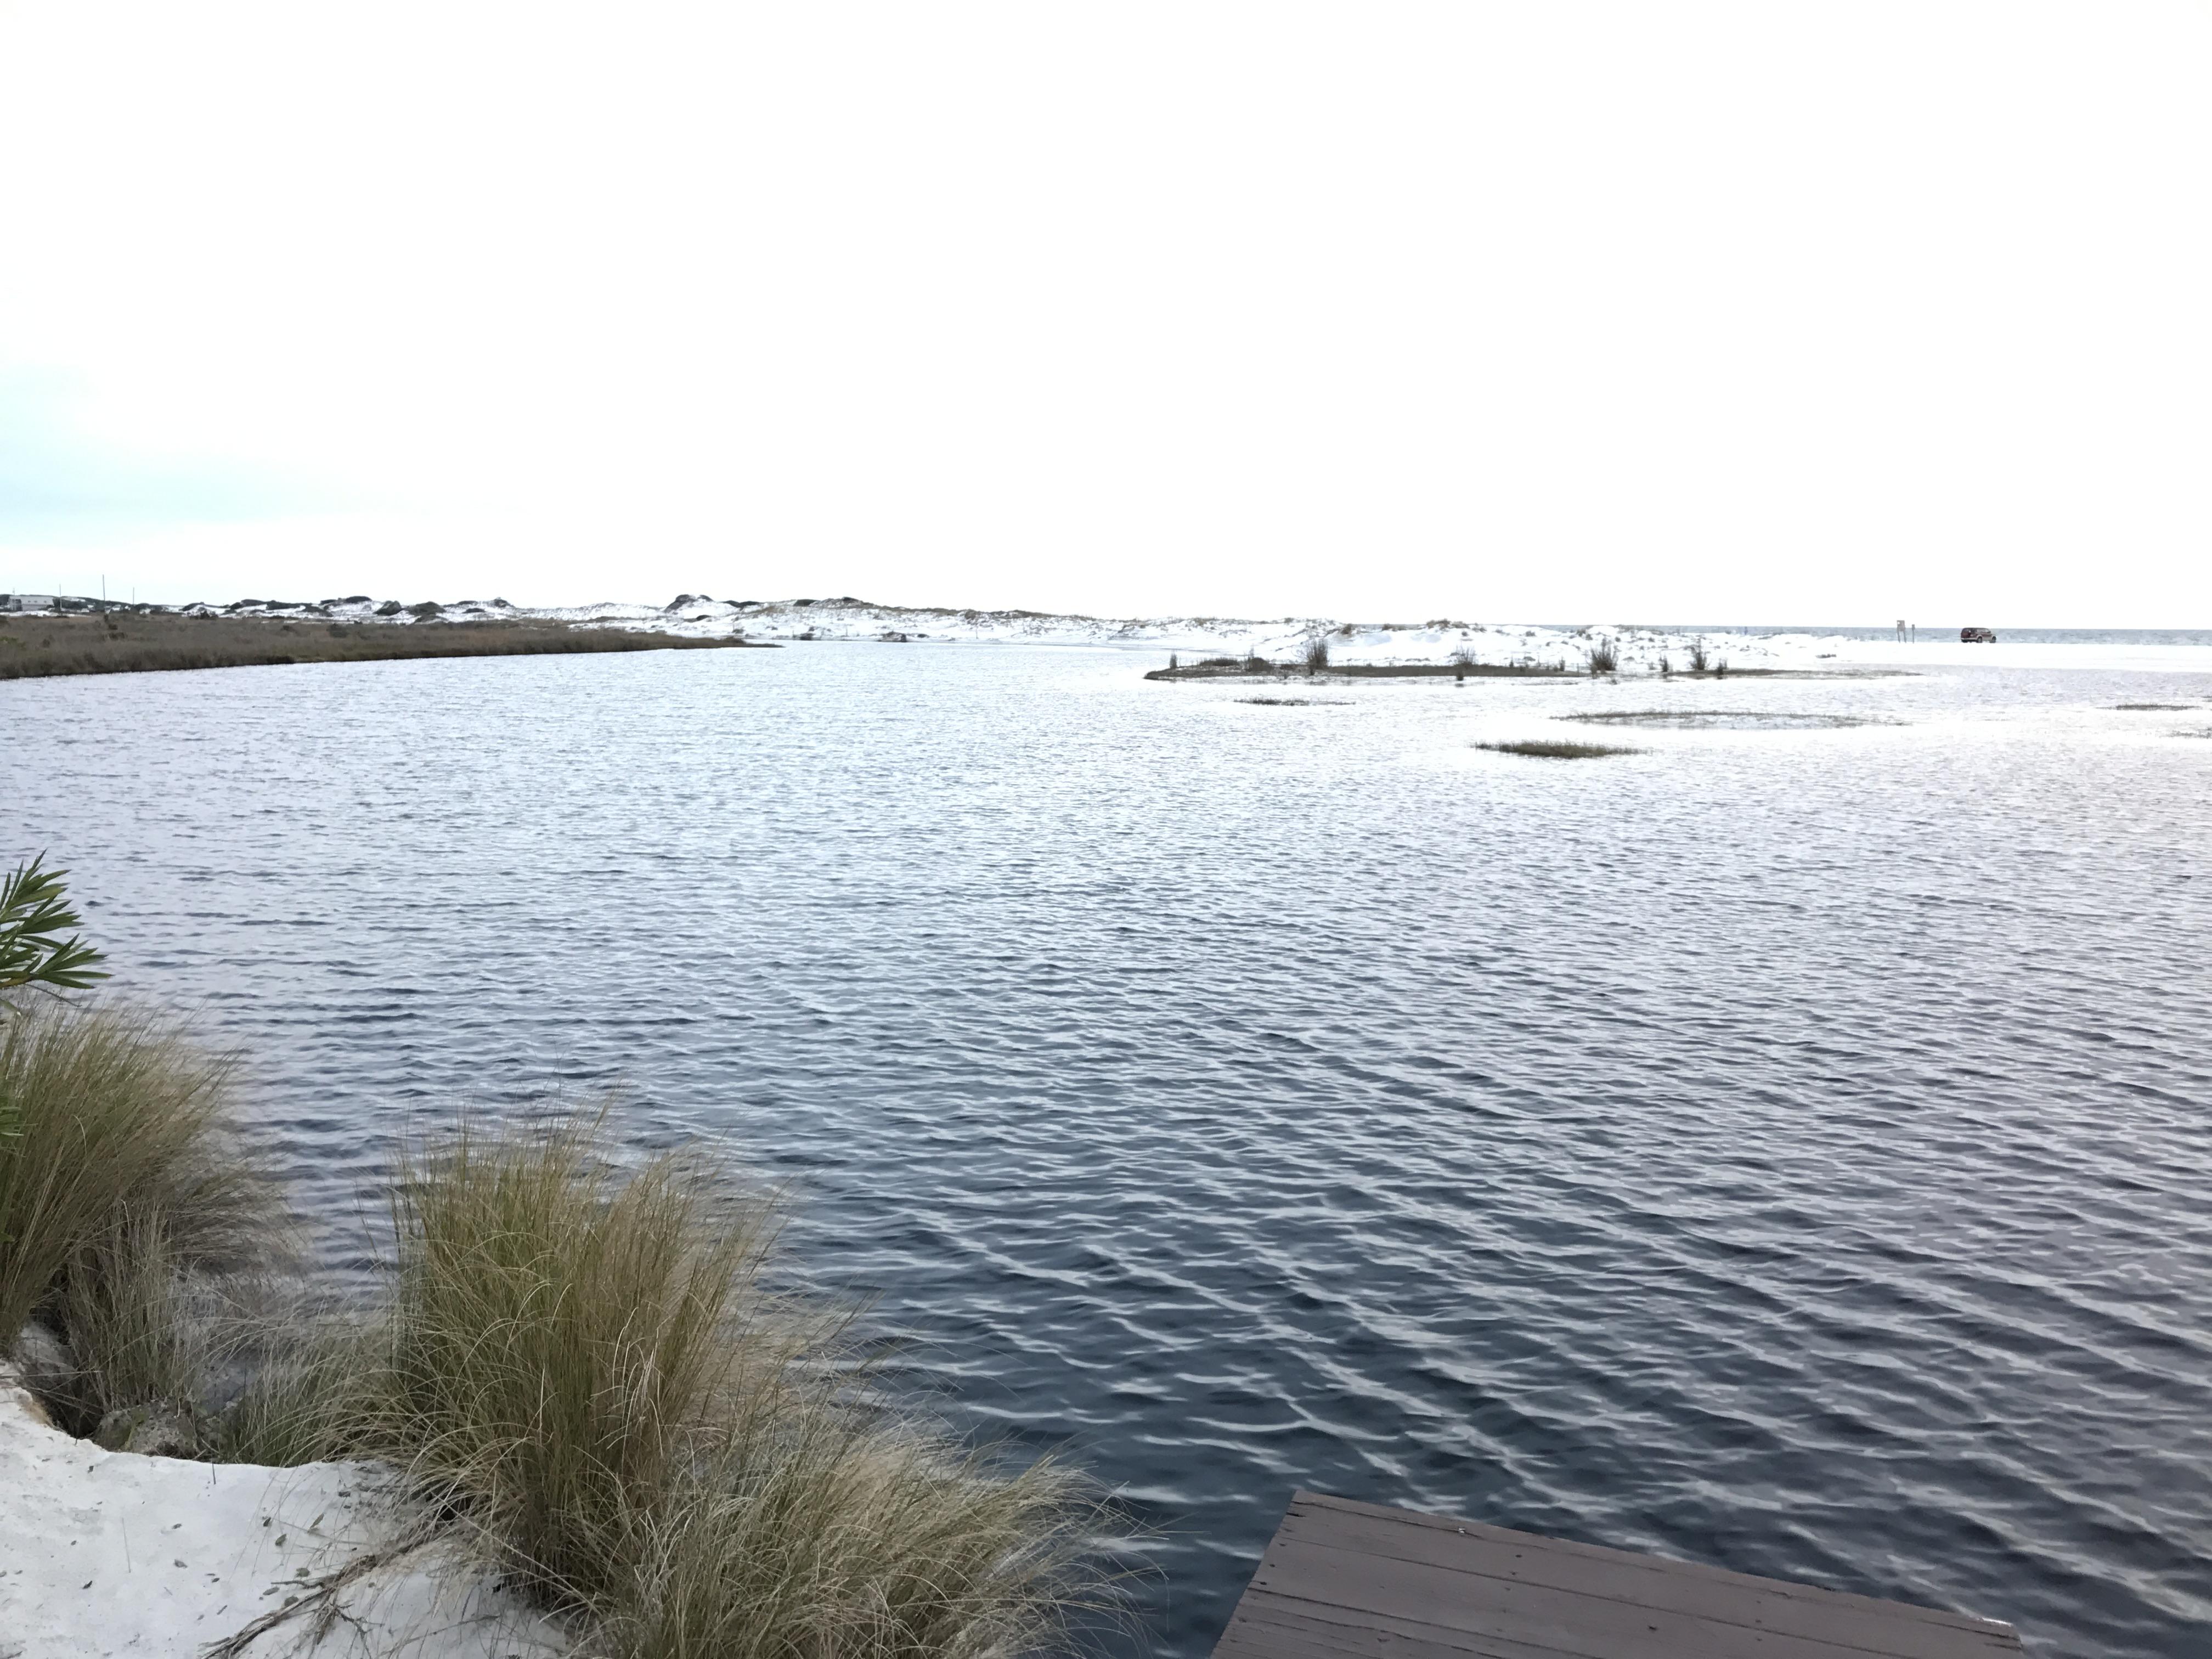 lake by the ocean